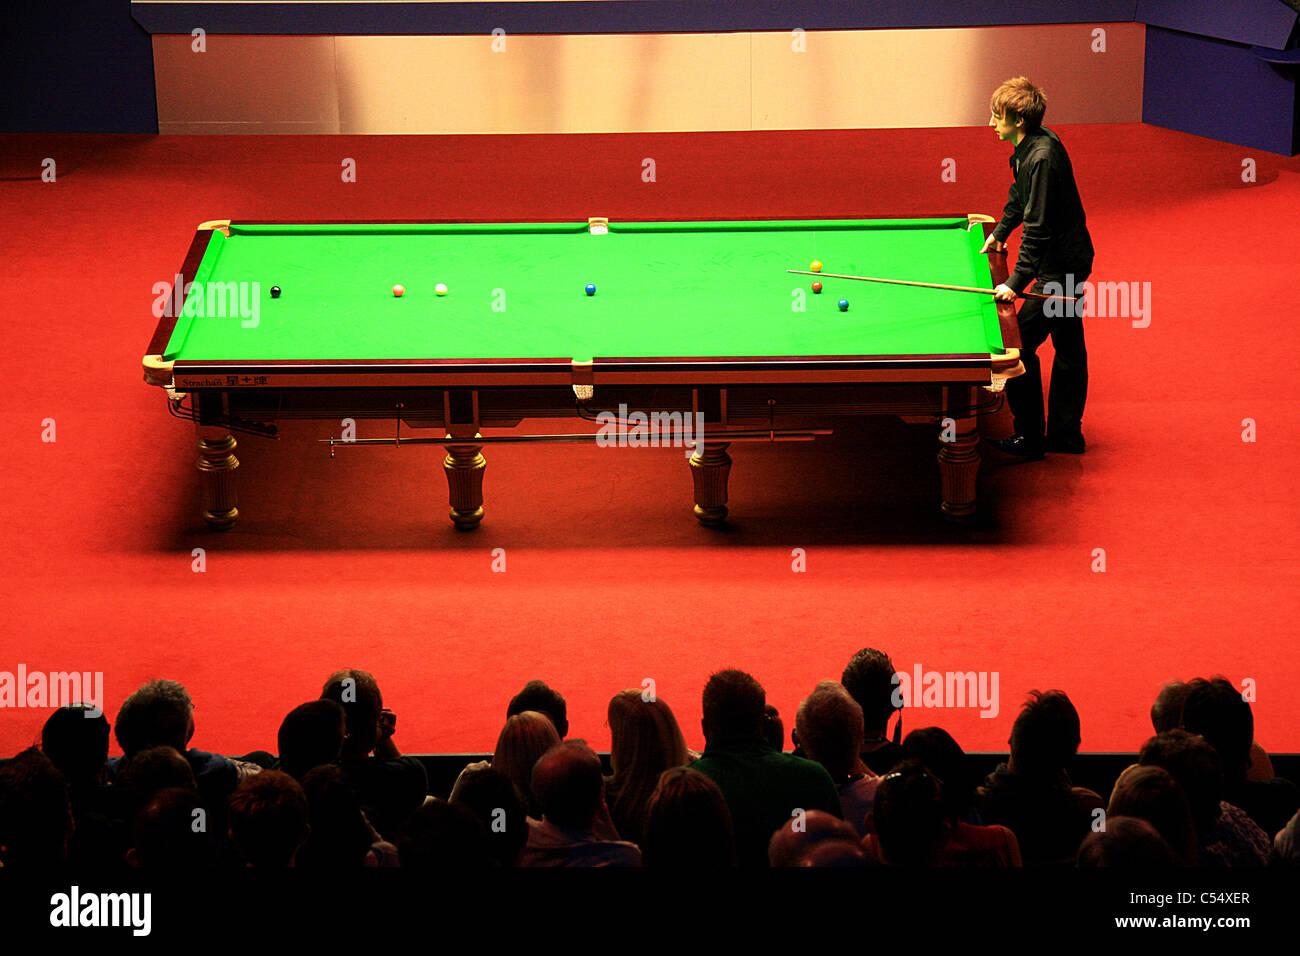 World Snooker Final - Stock Image